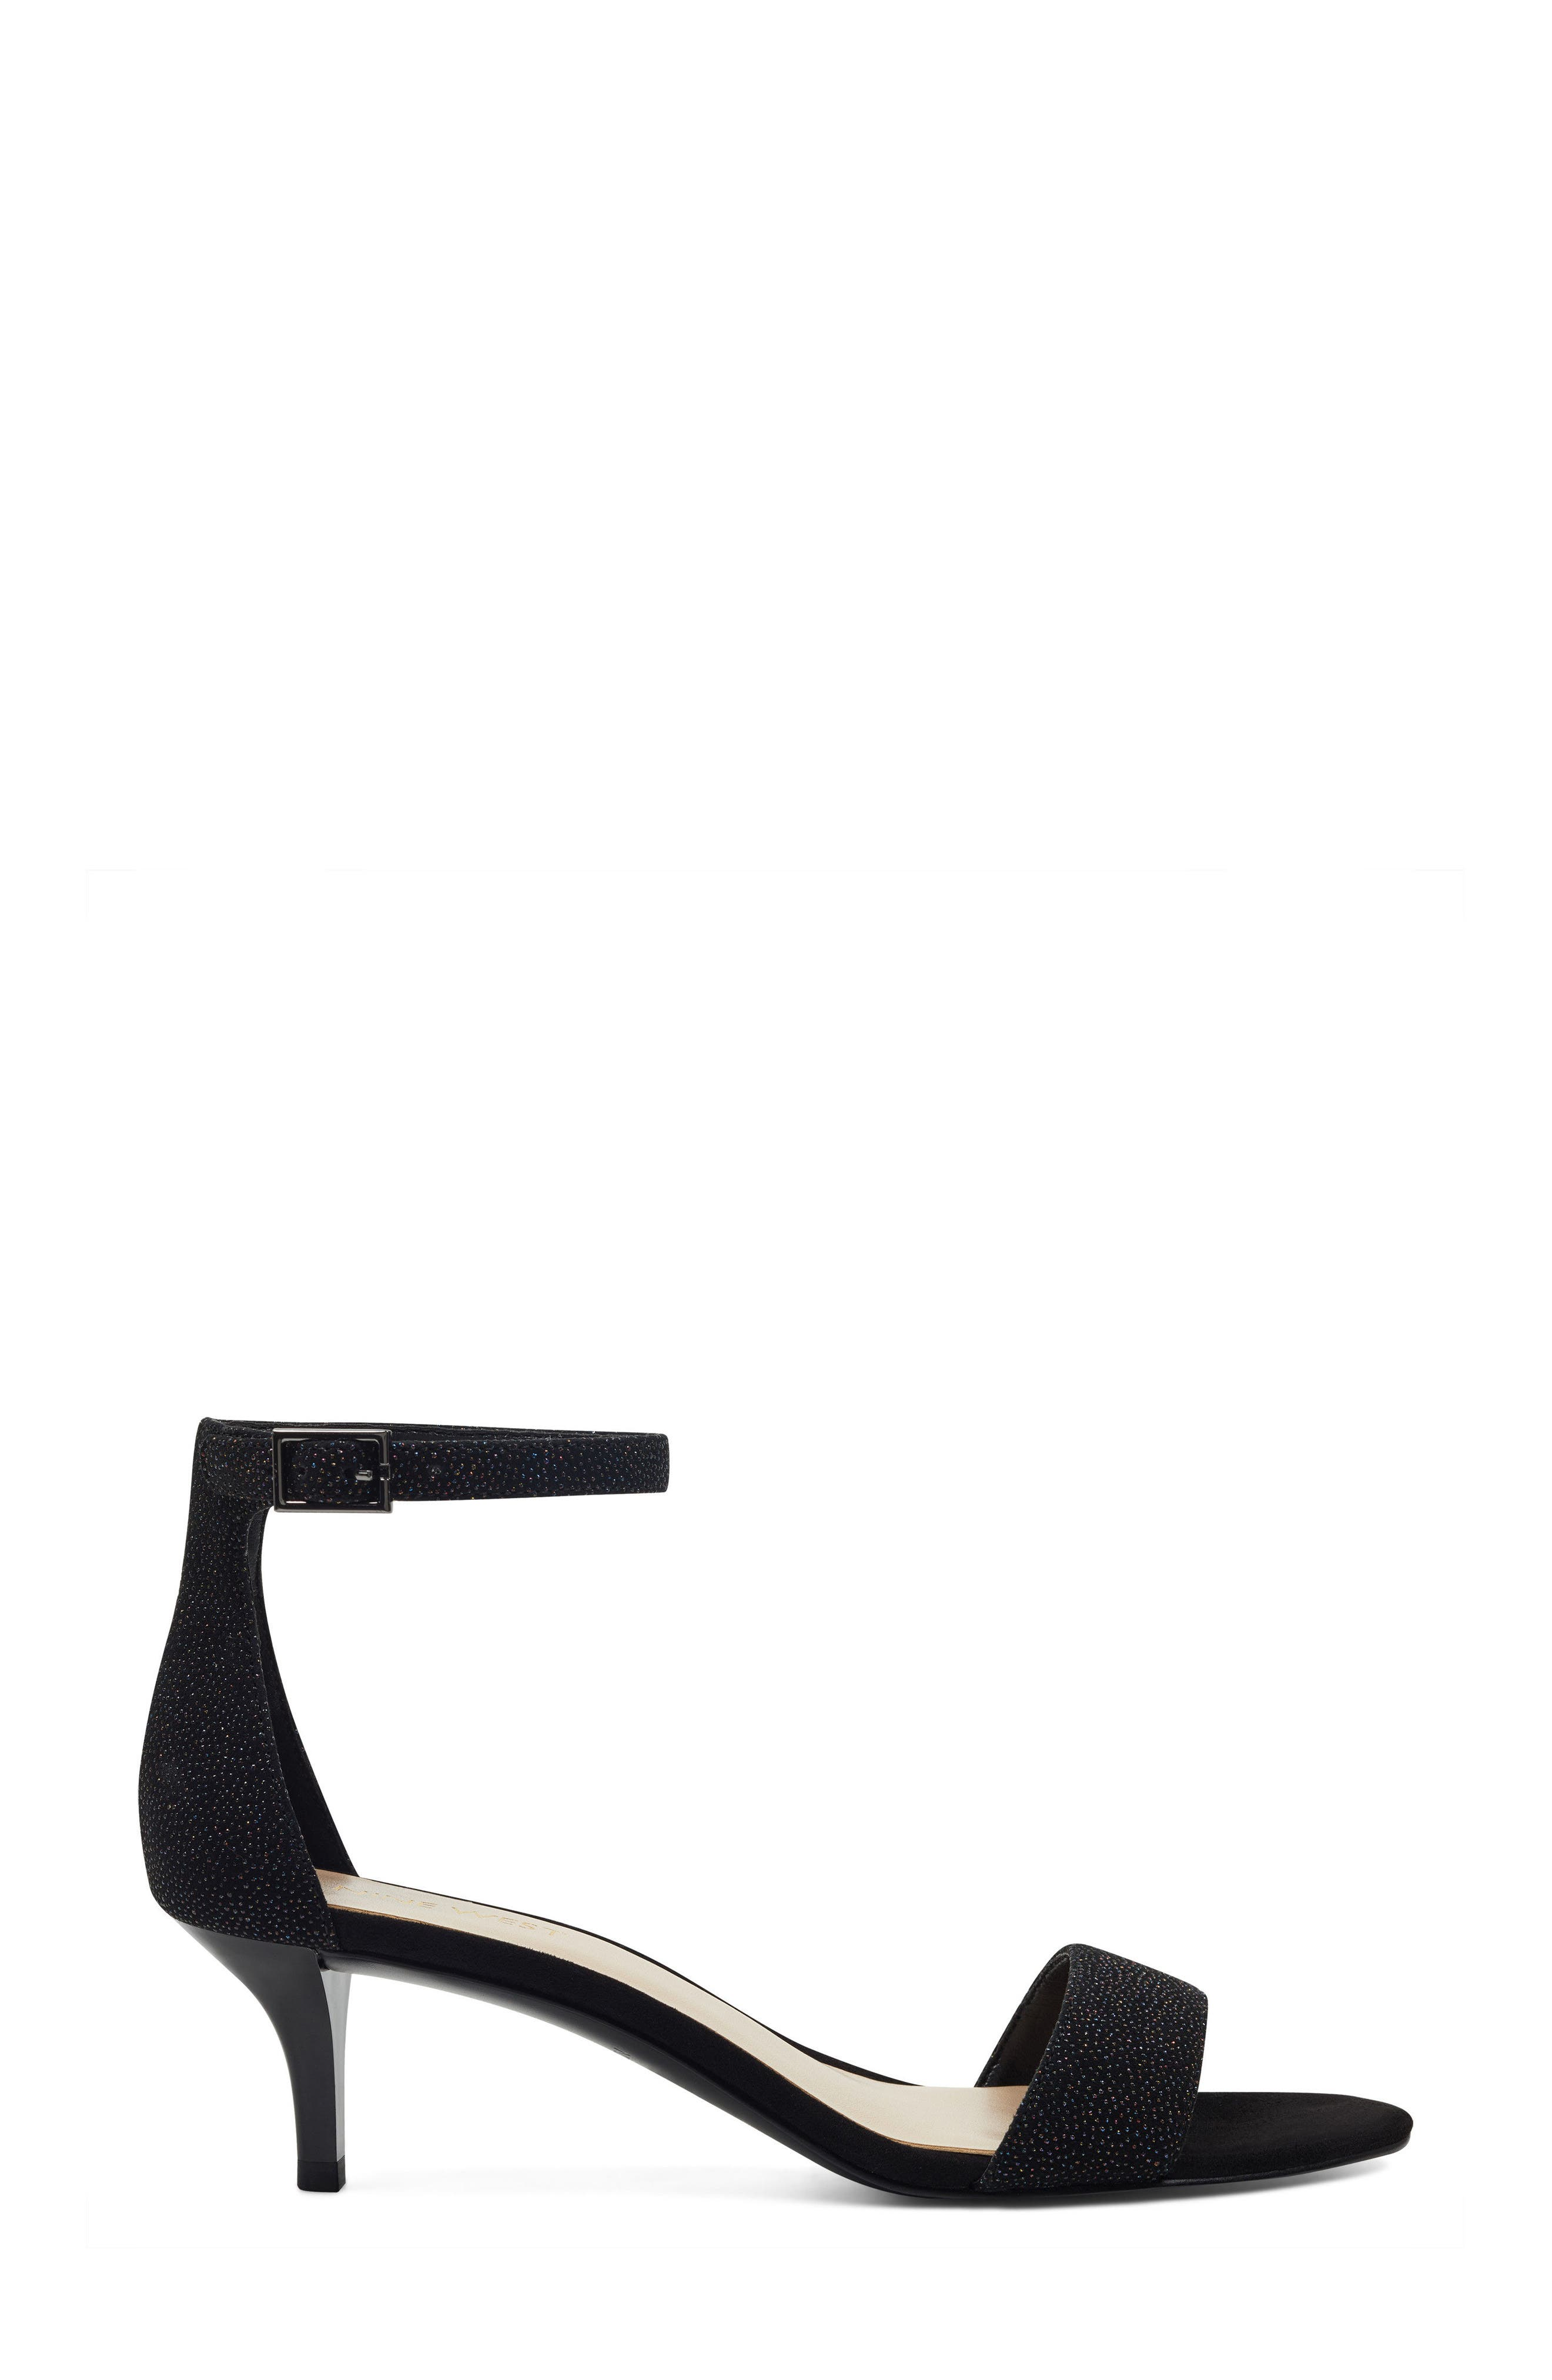 'Leisa' Ankle Strap Sandal,                             Alternate thumbnail 3, color,                             BLACK MULTI LEATHER